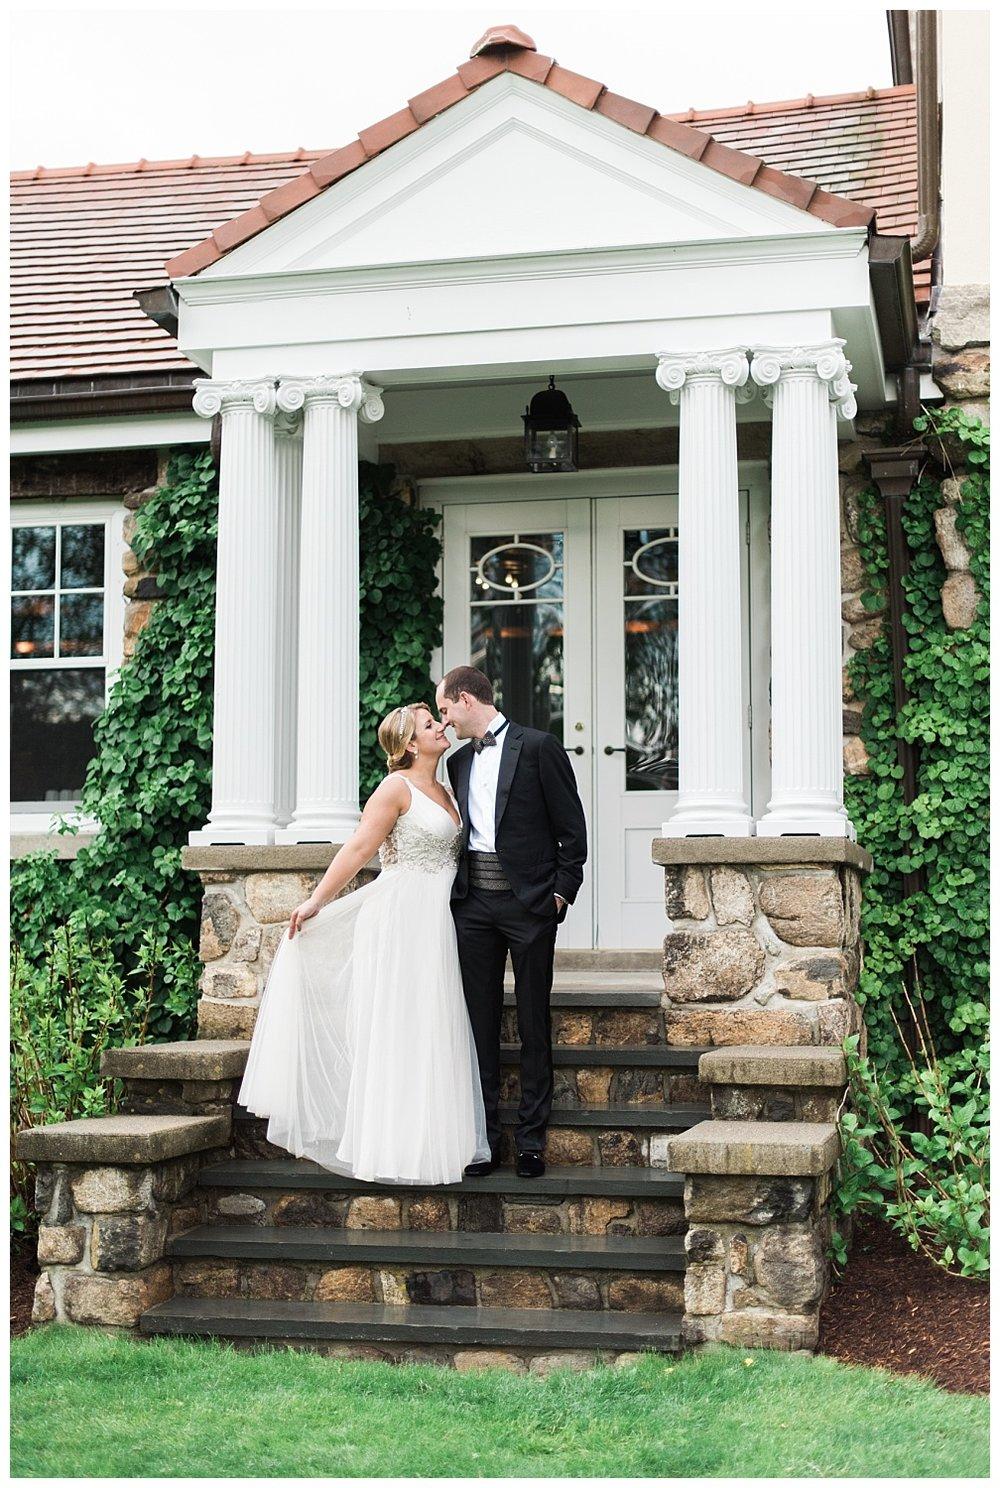 NJ-Andover-Hudson-Farm-Wedding-Outdoor-Photo-_0075.jpg